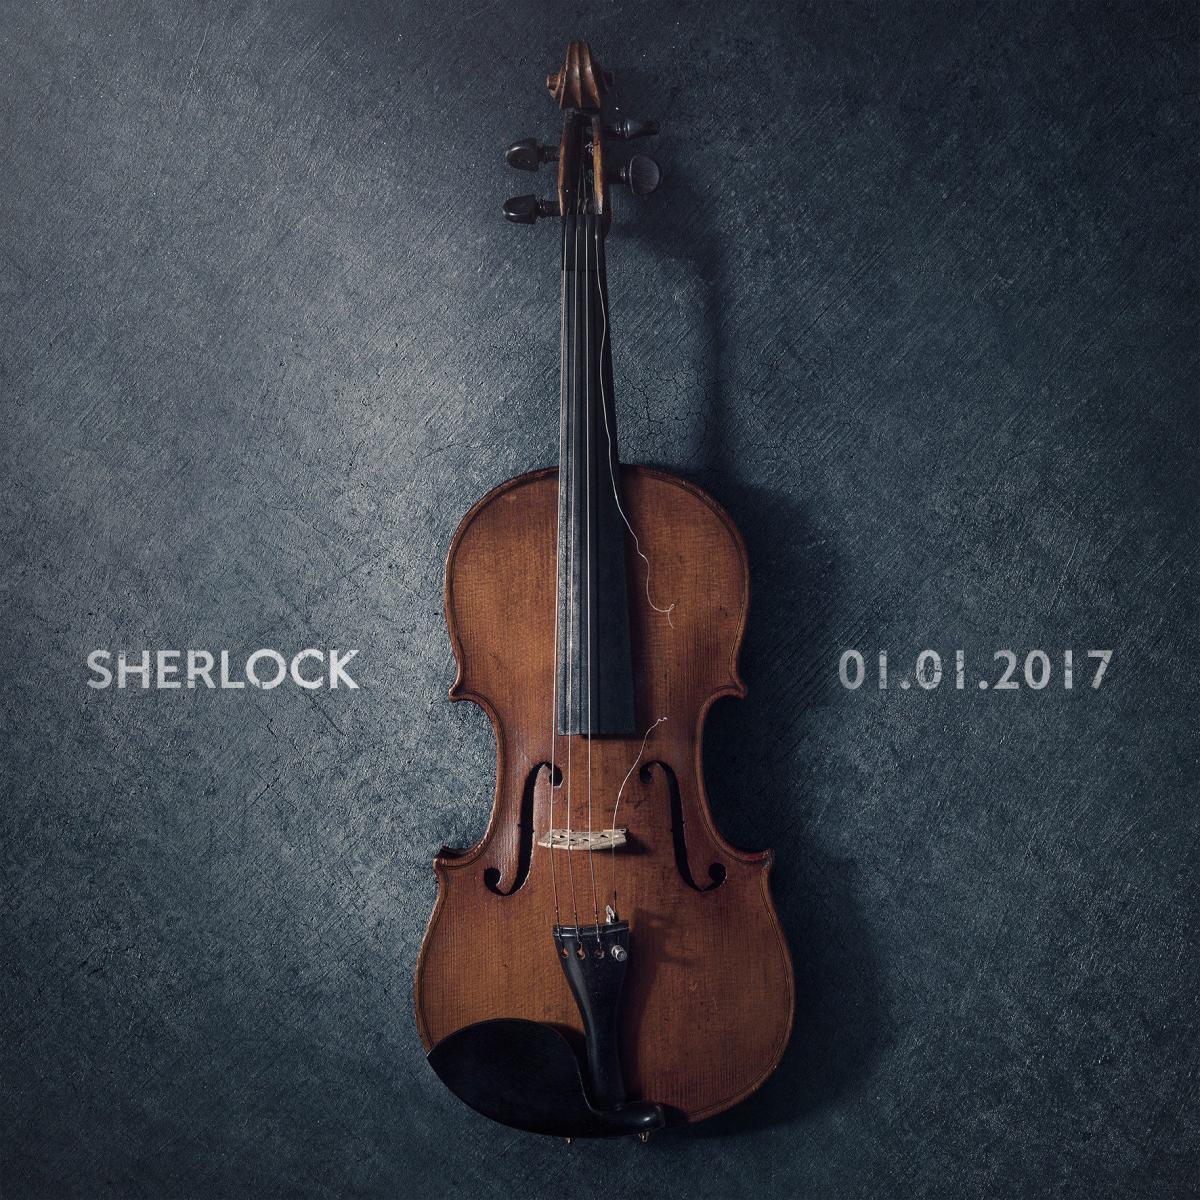 Sherlock 4 Season.jpg